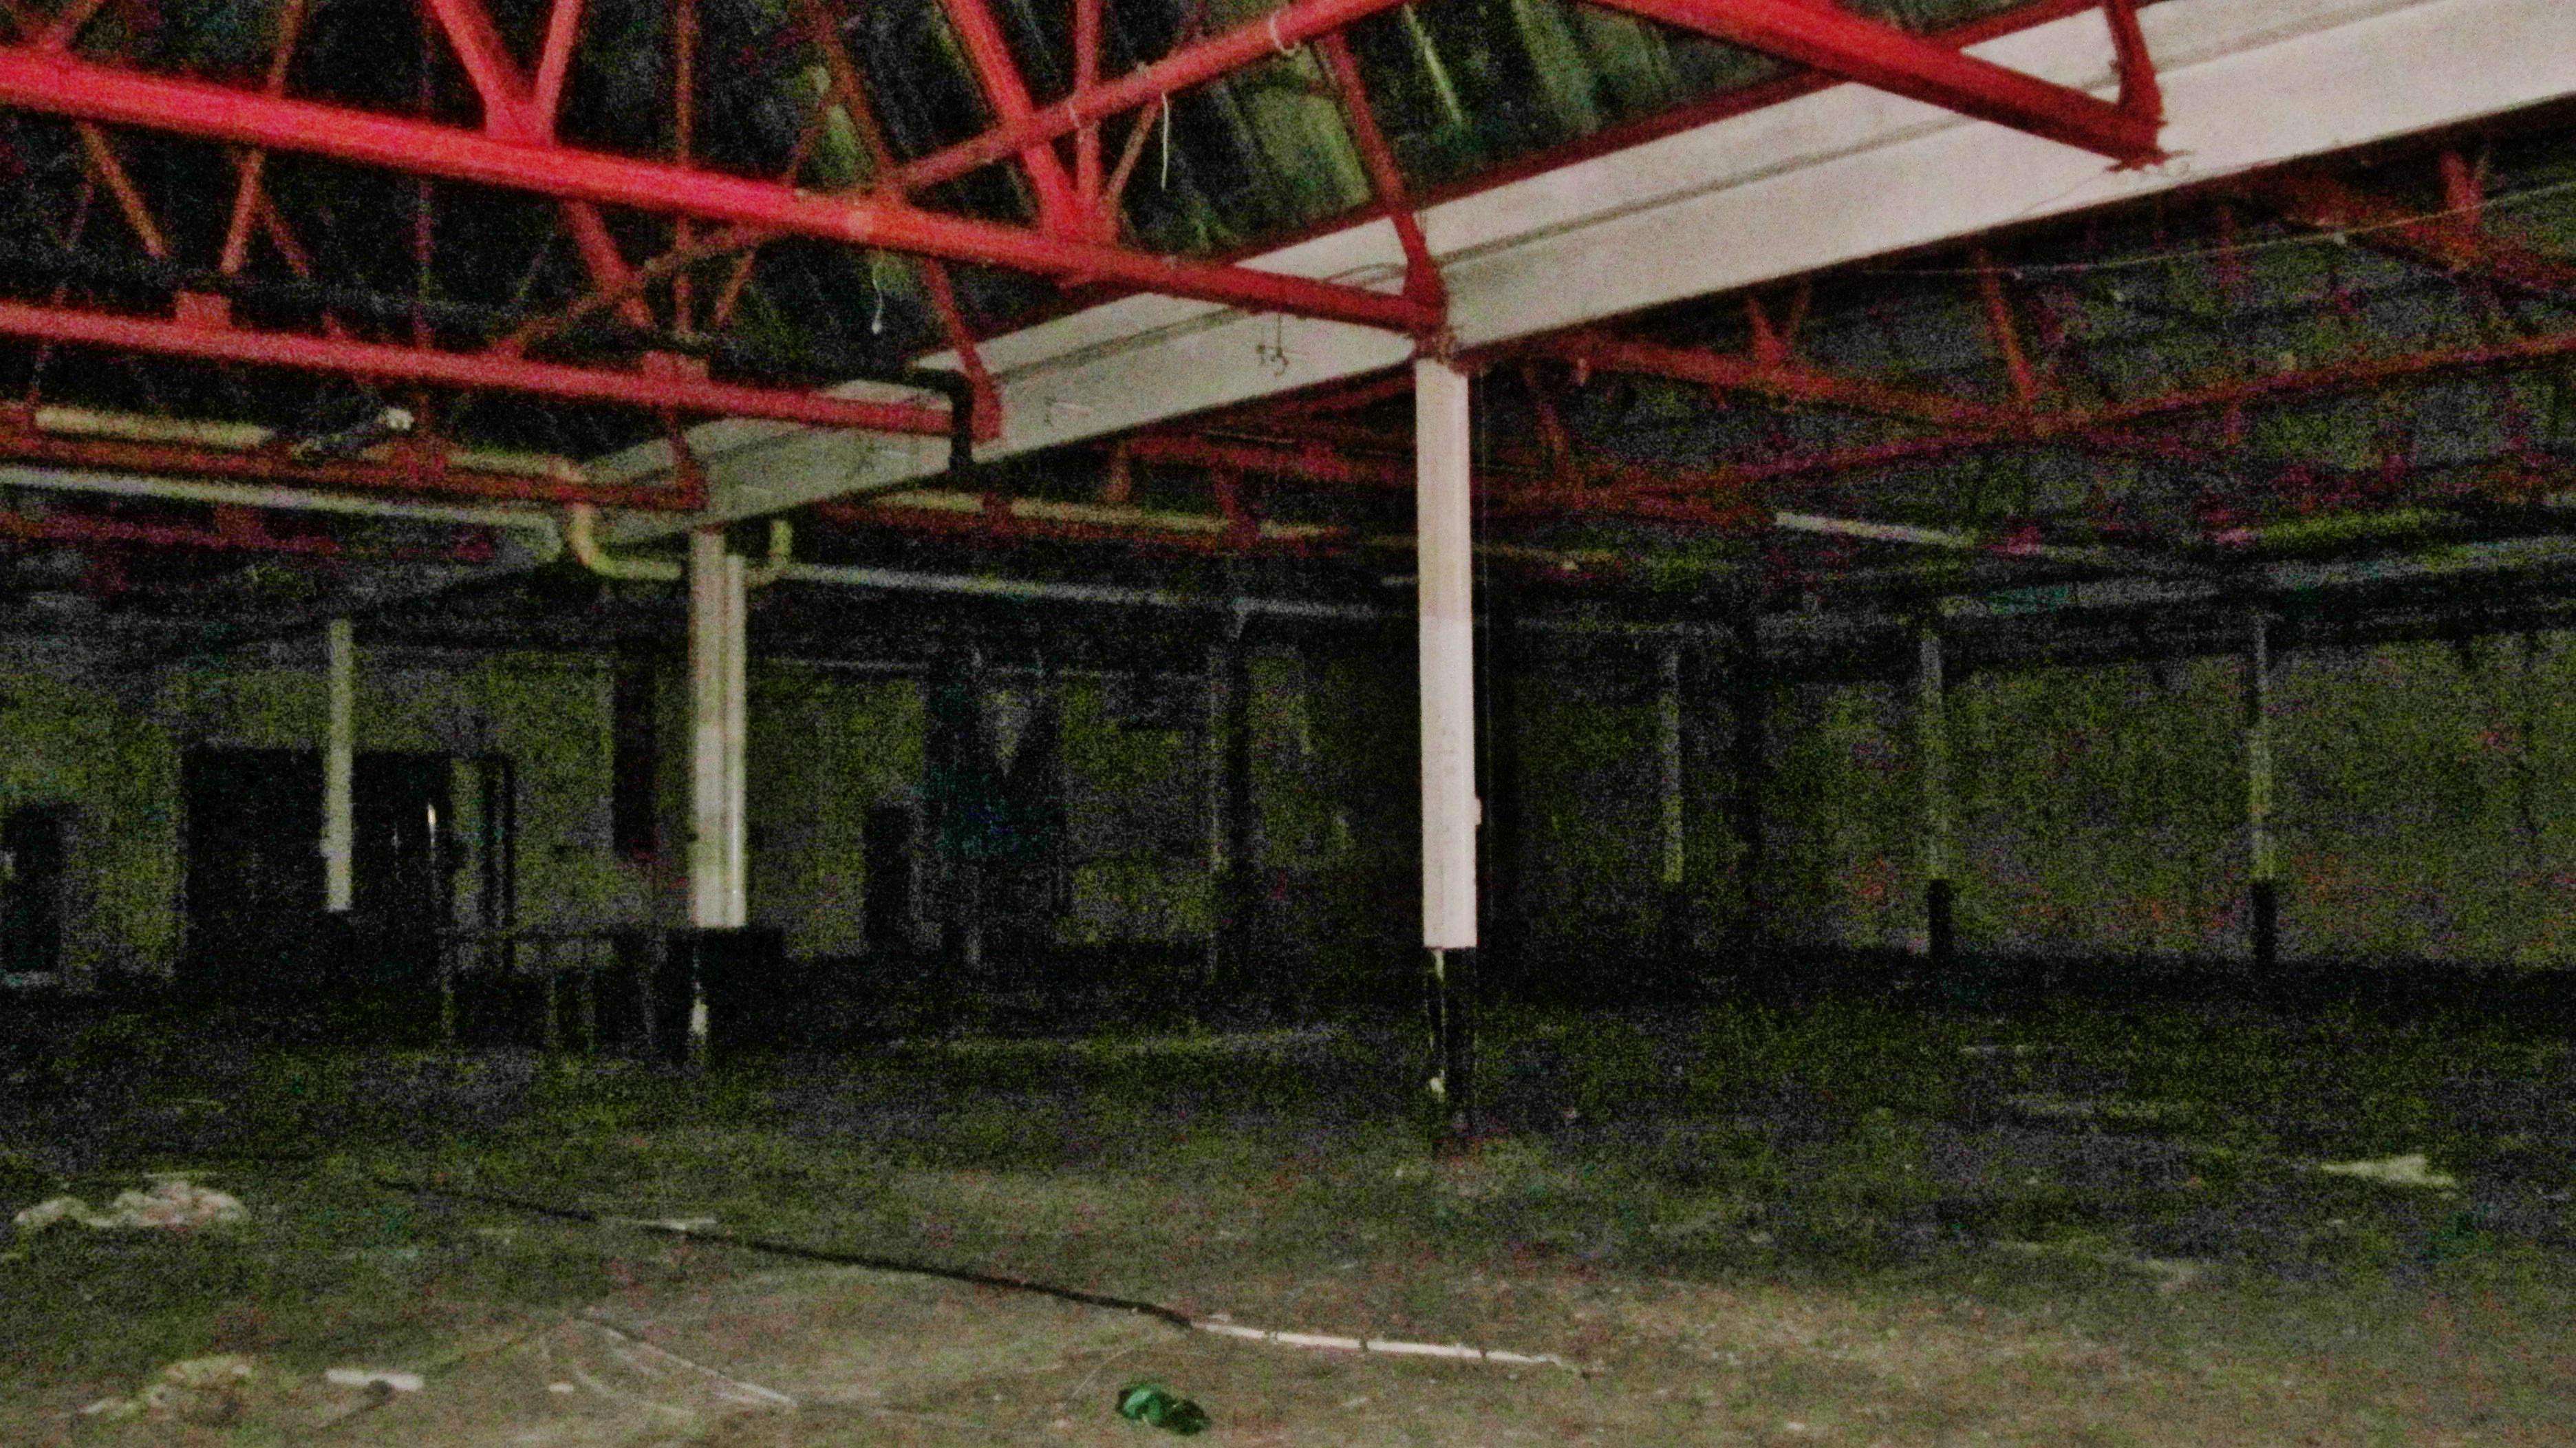 Abandoned Tayto Factory, Dublin (Ireland) - Derelict World Photography – Lainey Quinn